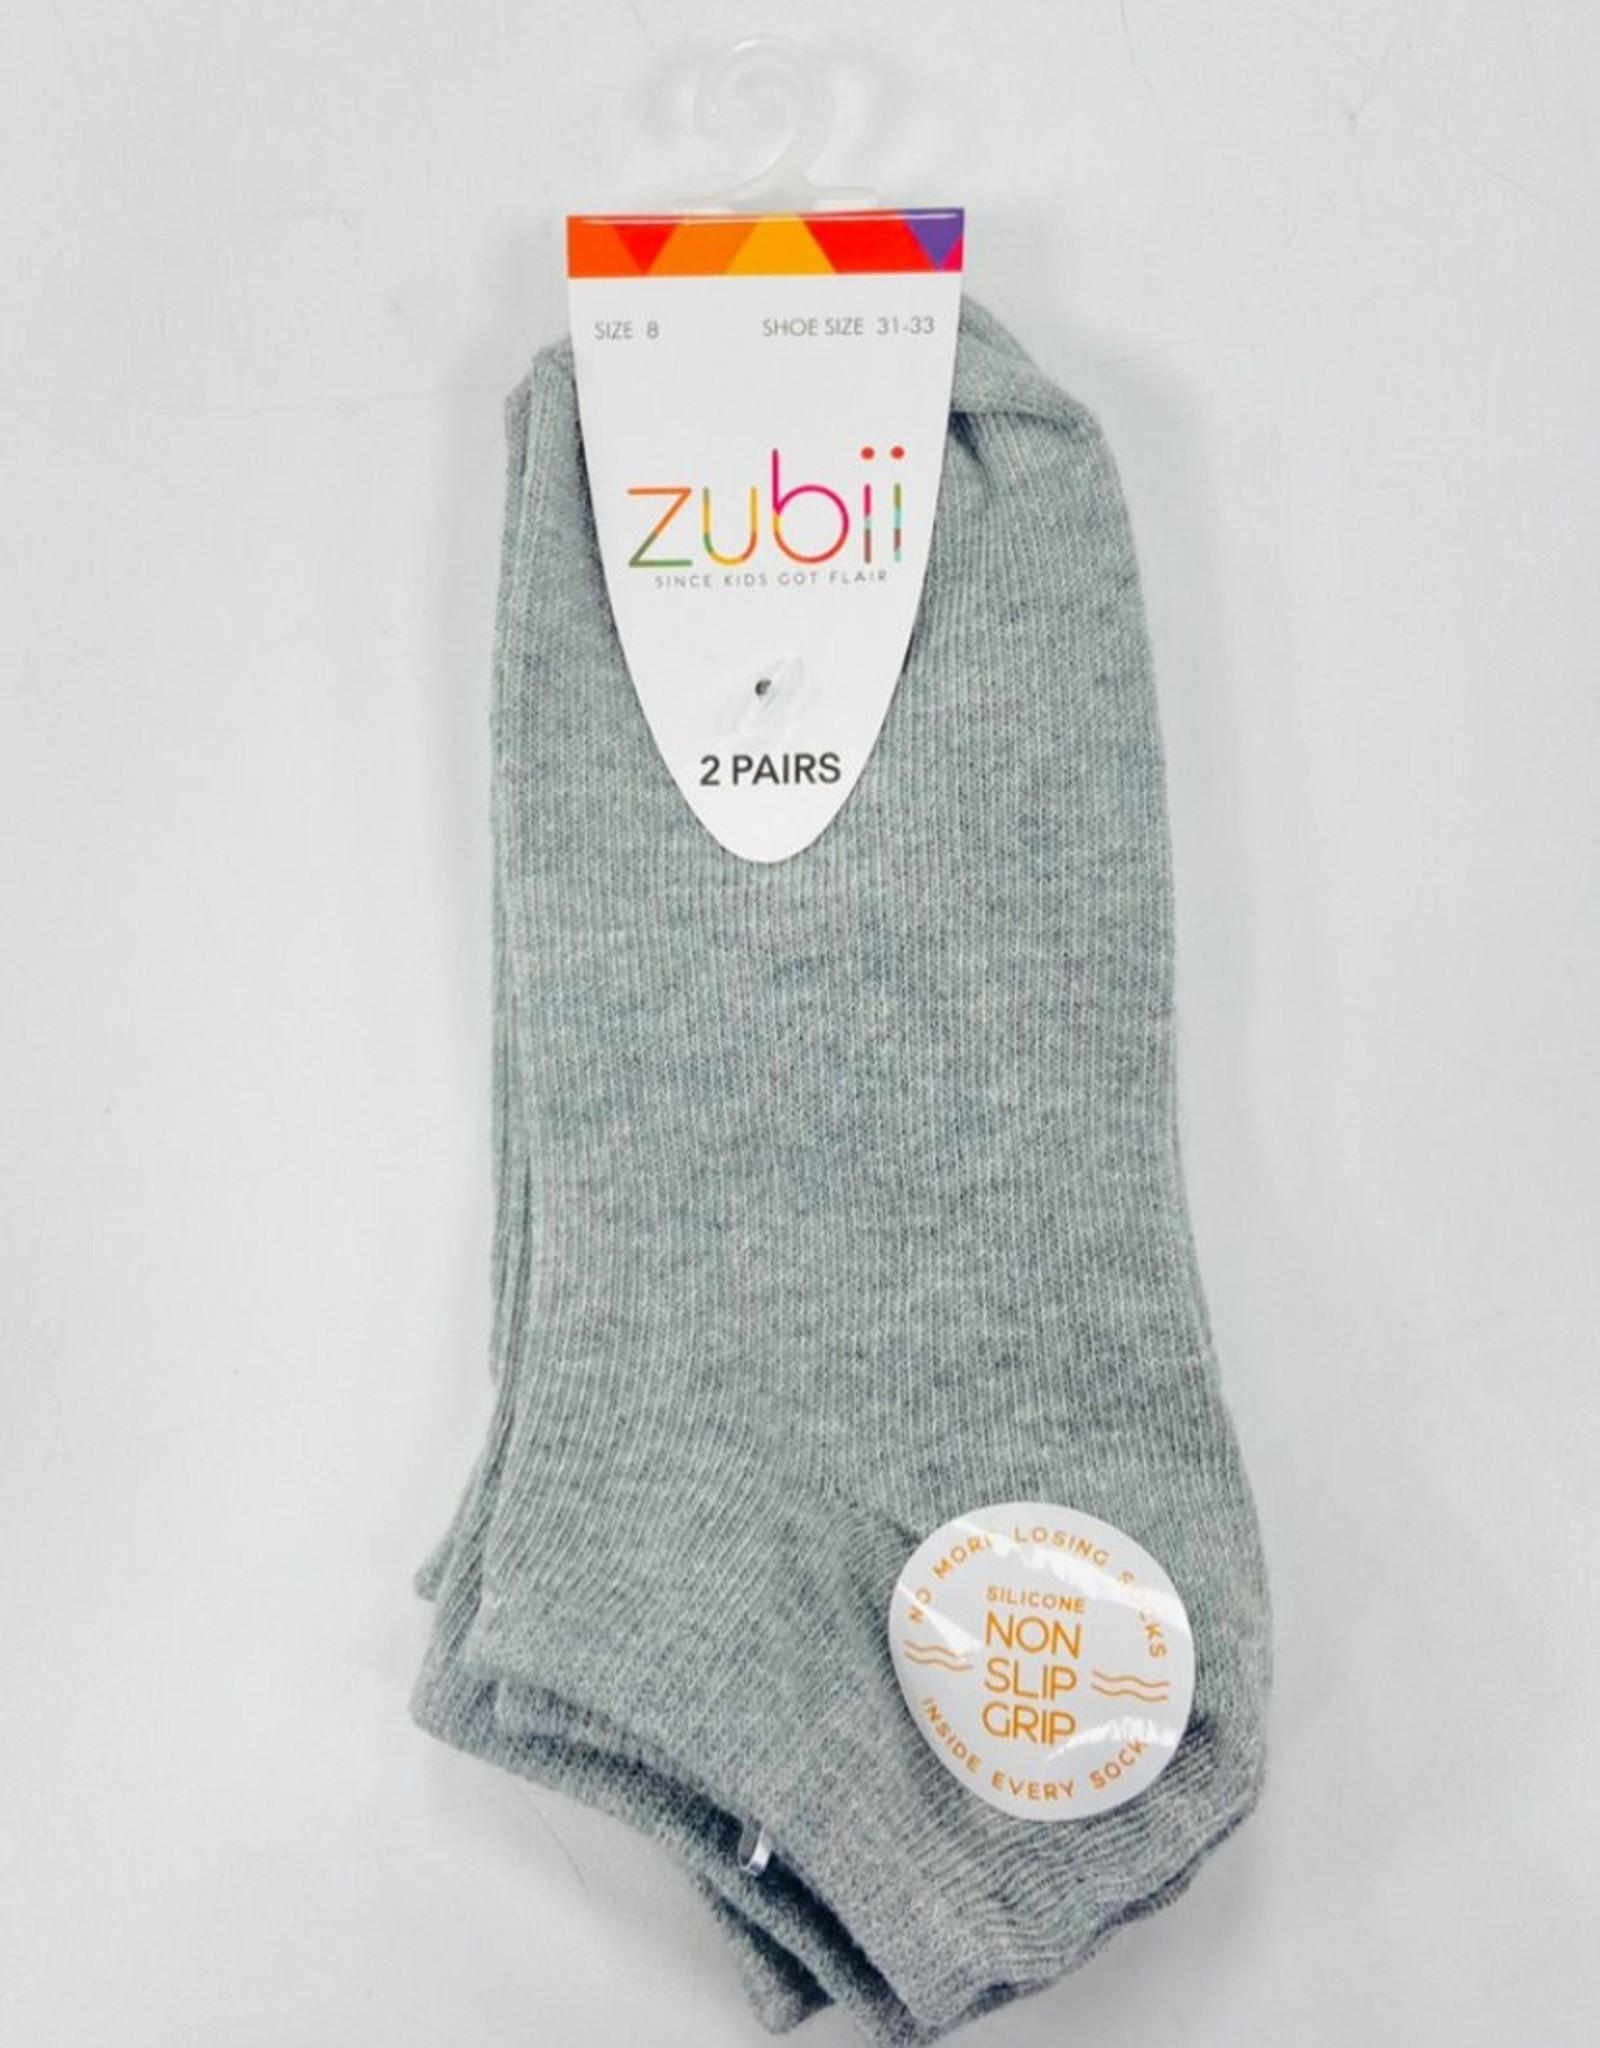 Zubii Zubii 2-Pack No Show Socks with Non Slip Grip